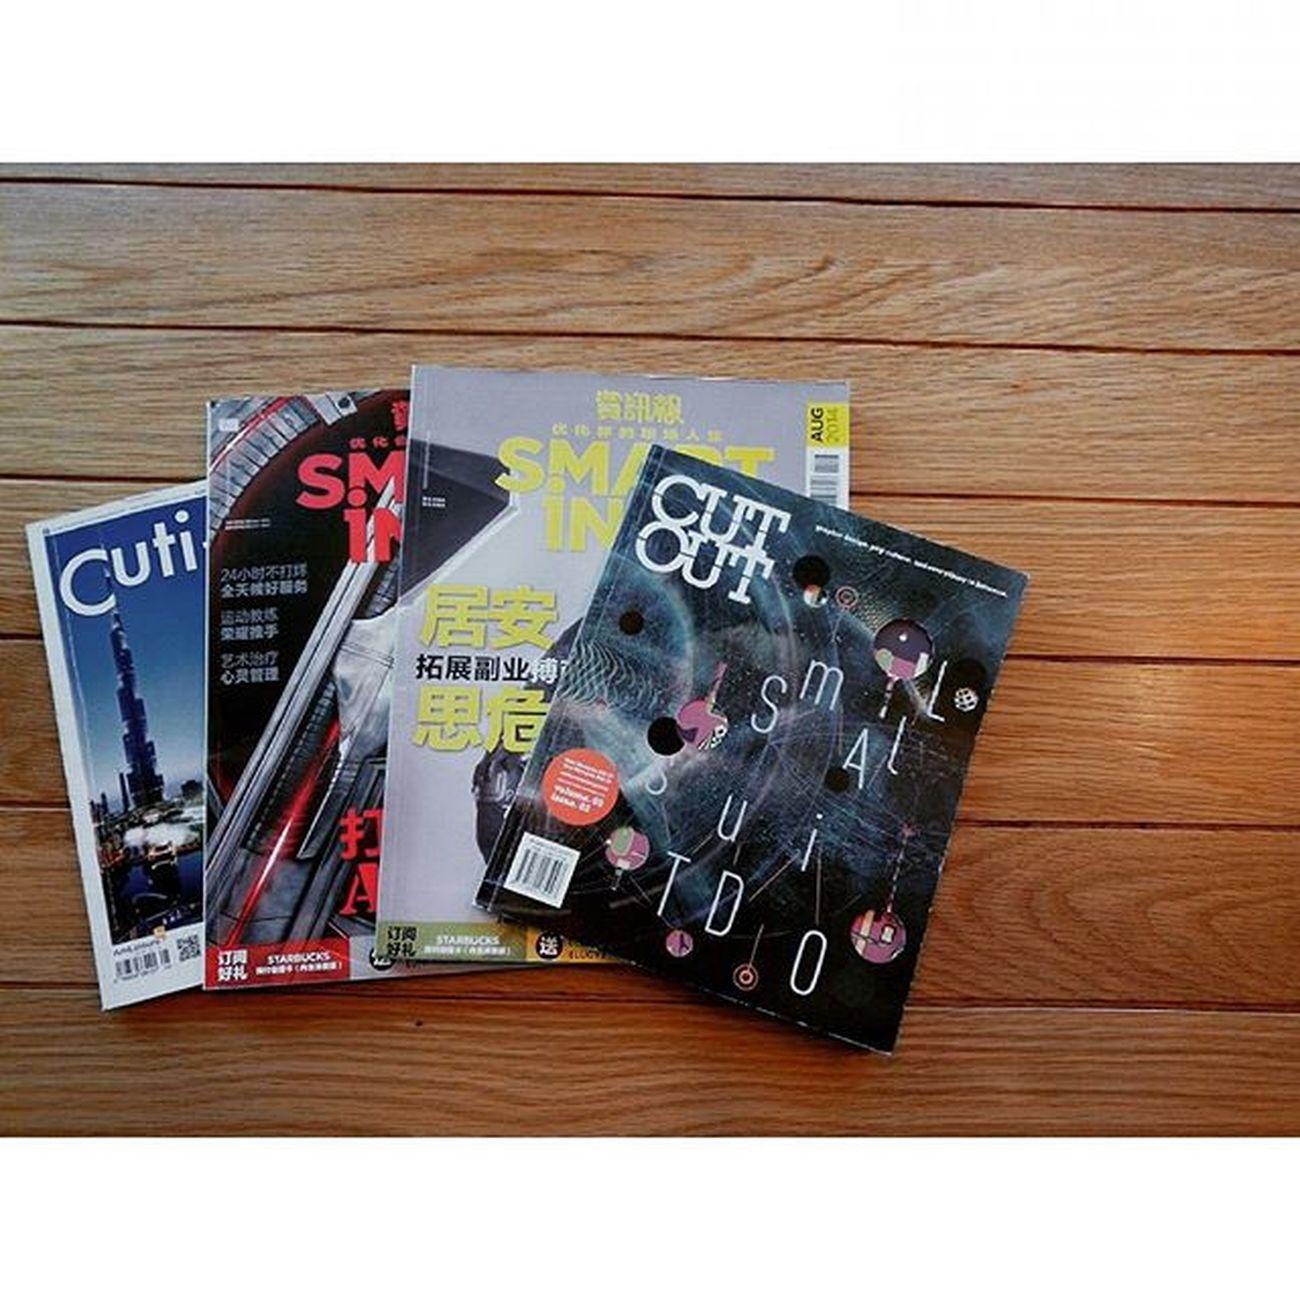 Chillax tuesday. 230915 Tuesday Books Magazines Photography Lenovo Instagram Instapost Instalike Instadaily VSCO Vscofile Vscocam Myalbum